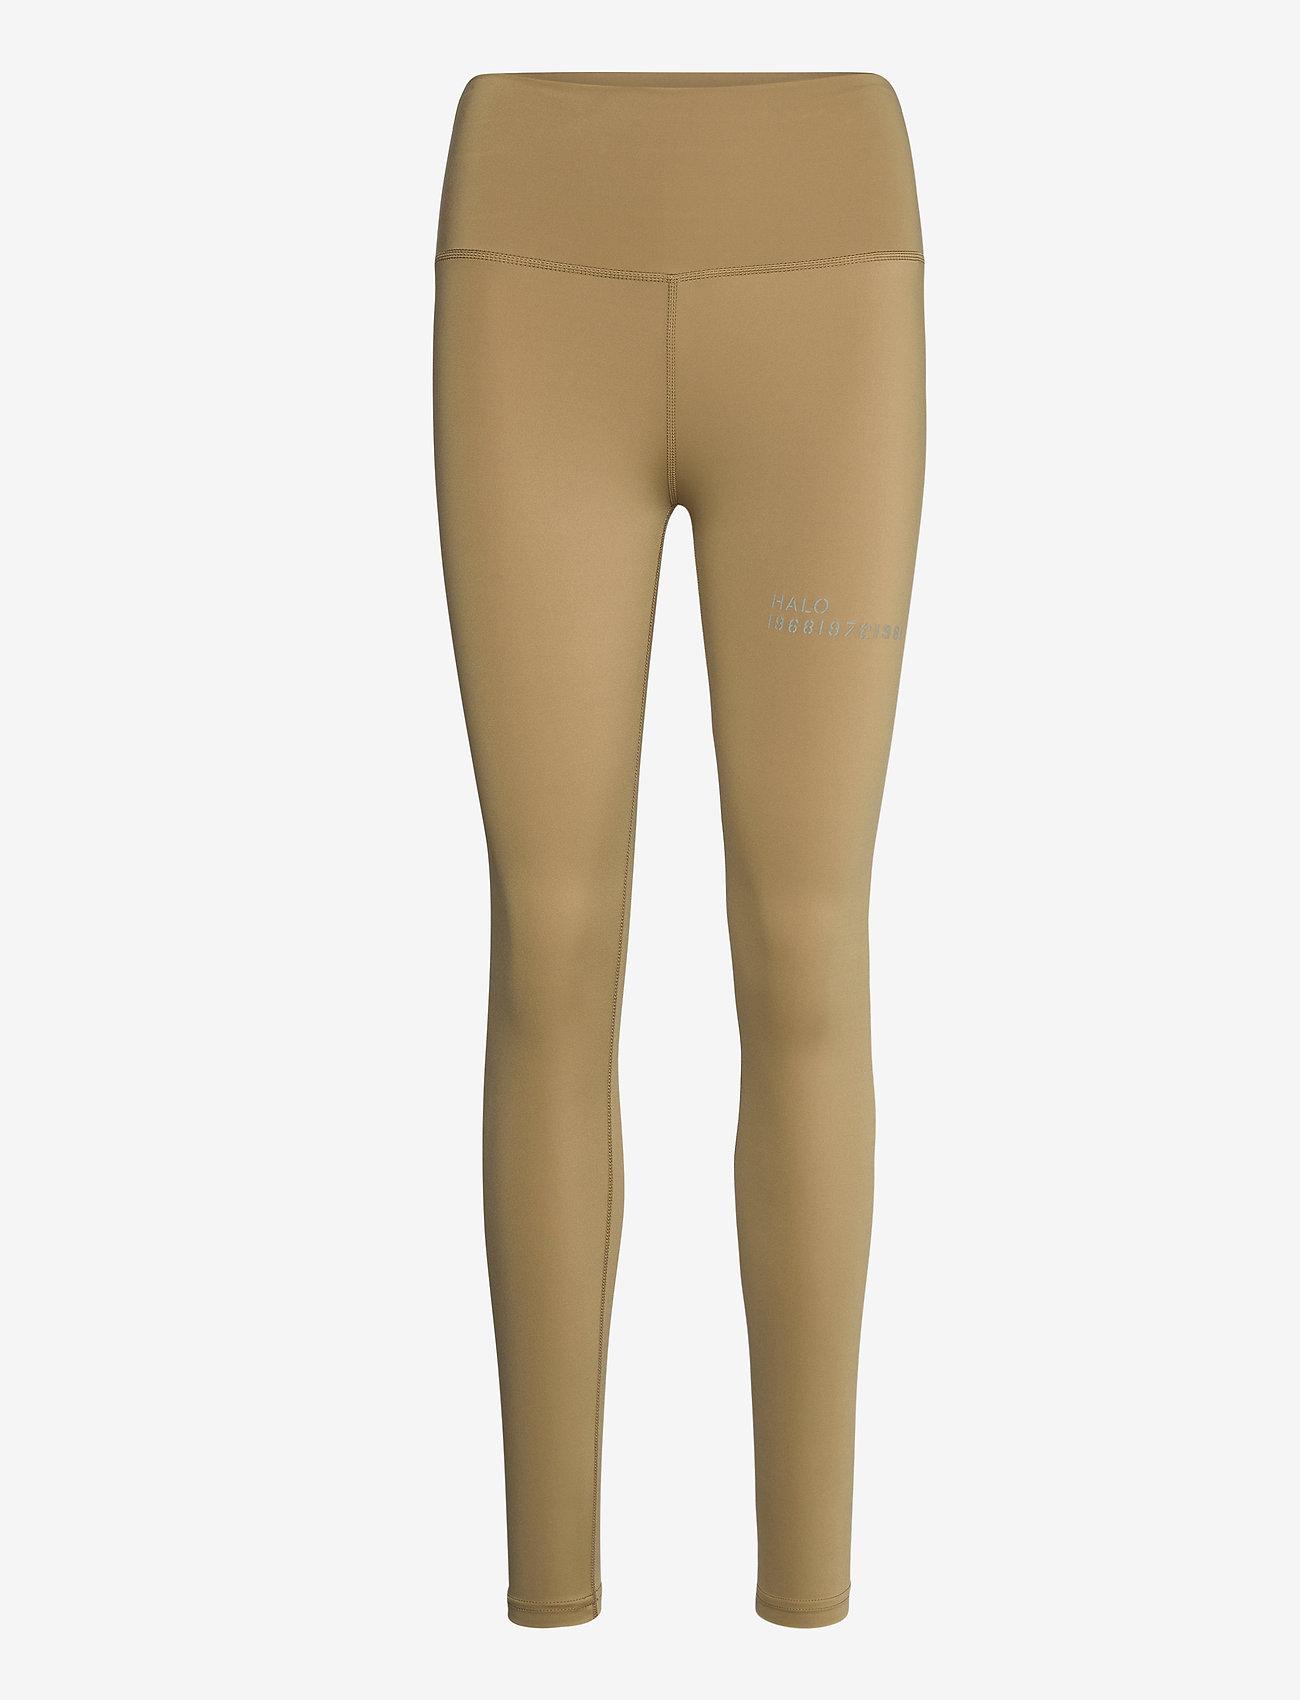 HALO - HALO WOMENS HIGHRISE TIGHTS - tights & shorts - kelp - 0